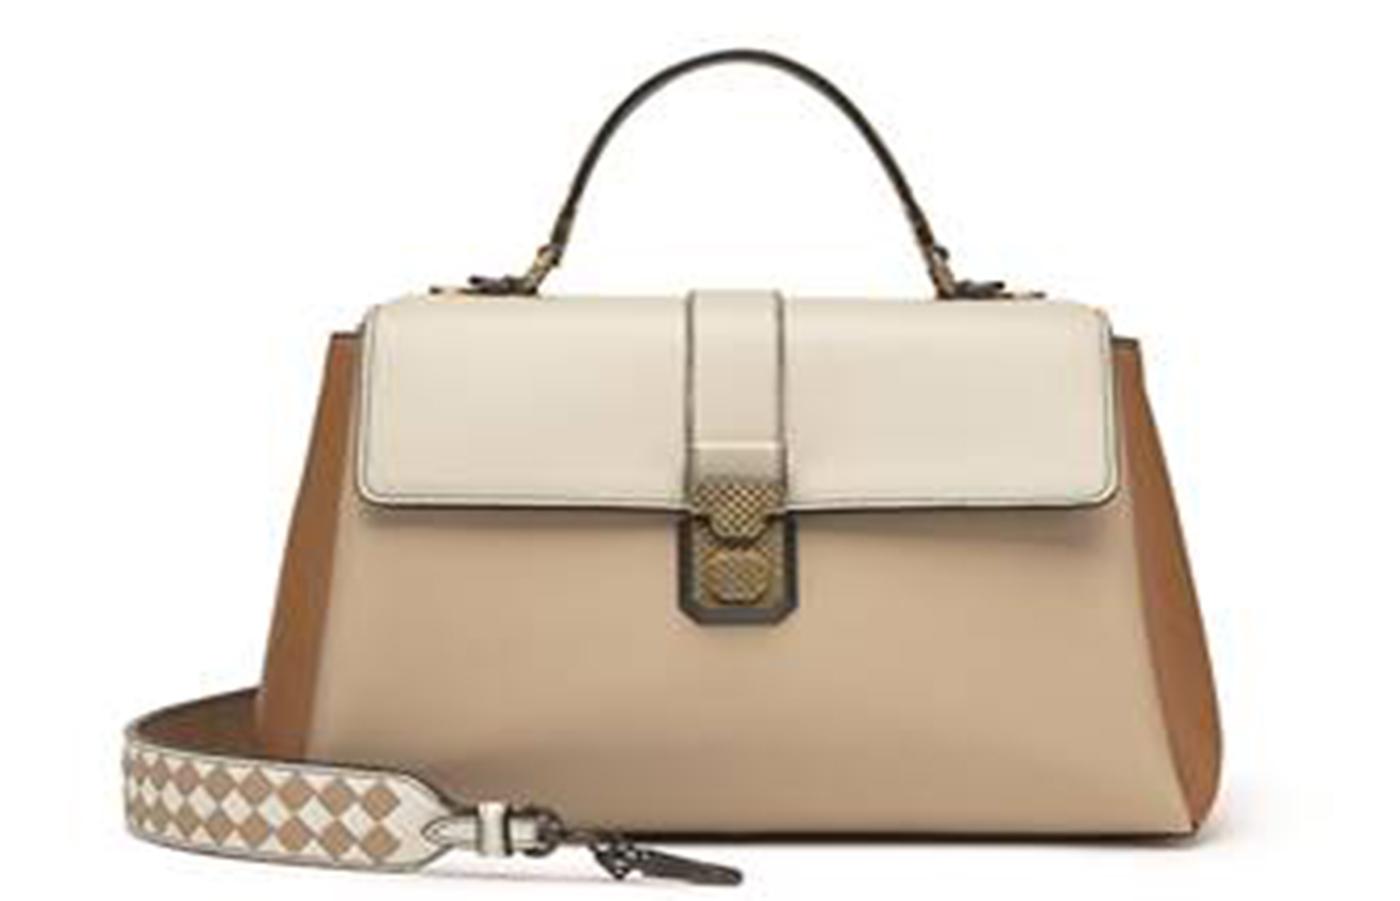 Bottega Veneta release 2018 cruise collection accessories – The ... 565b21446cdf3